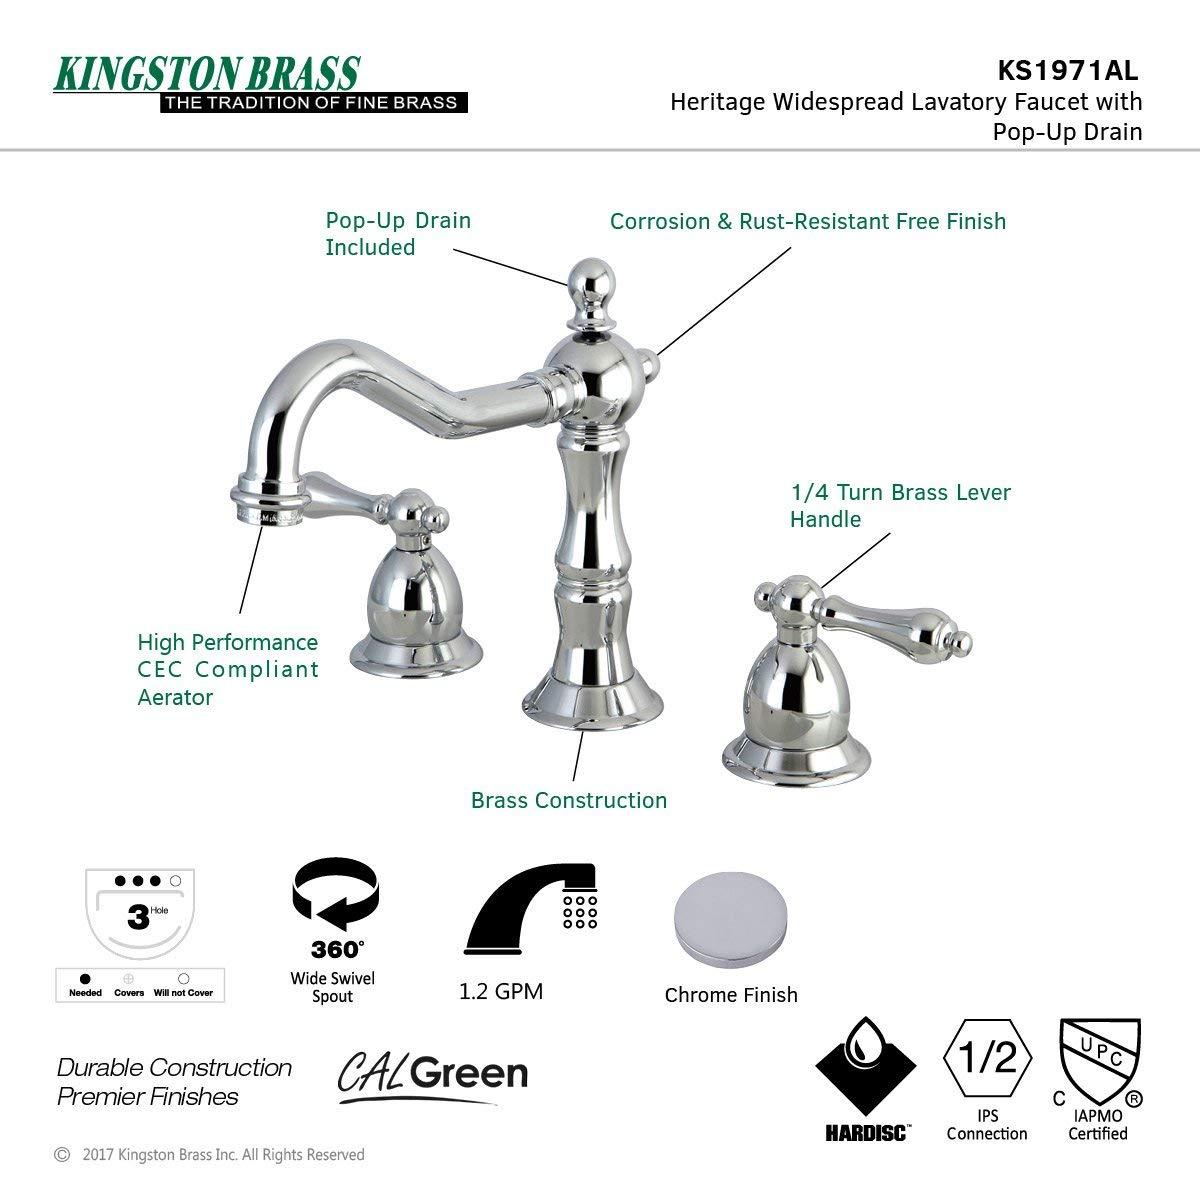 7-9//16 inch in Spout Reach Kingston Brass KS1970AL Heritage 8-Inch Widespread Lavatory Faucet with Brass Pop-Up Matte Black